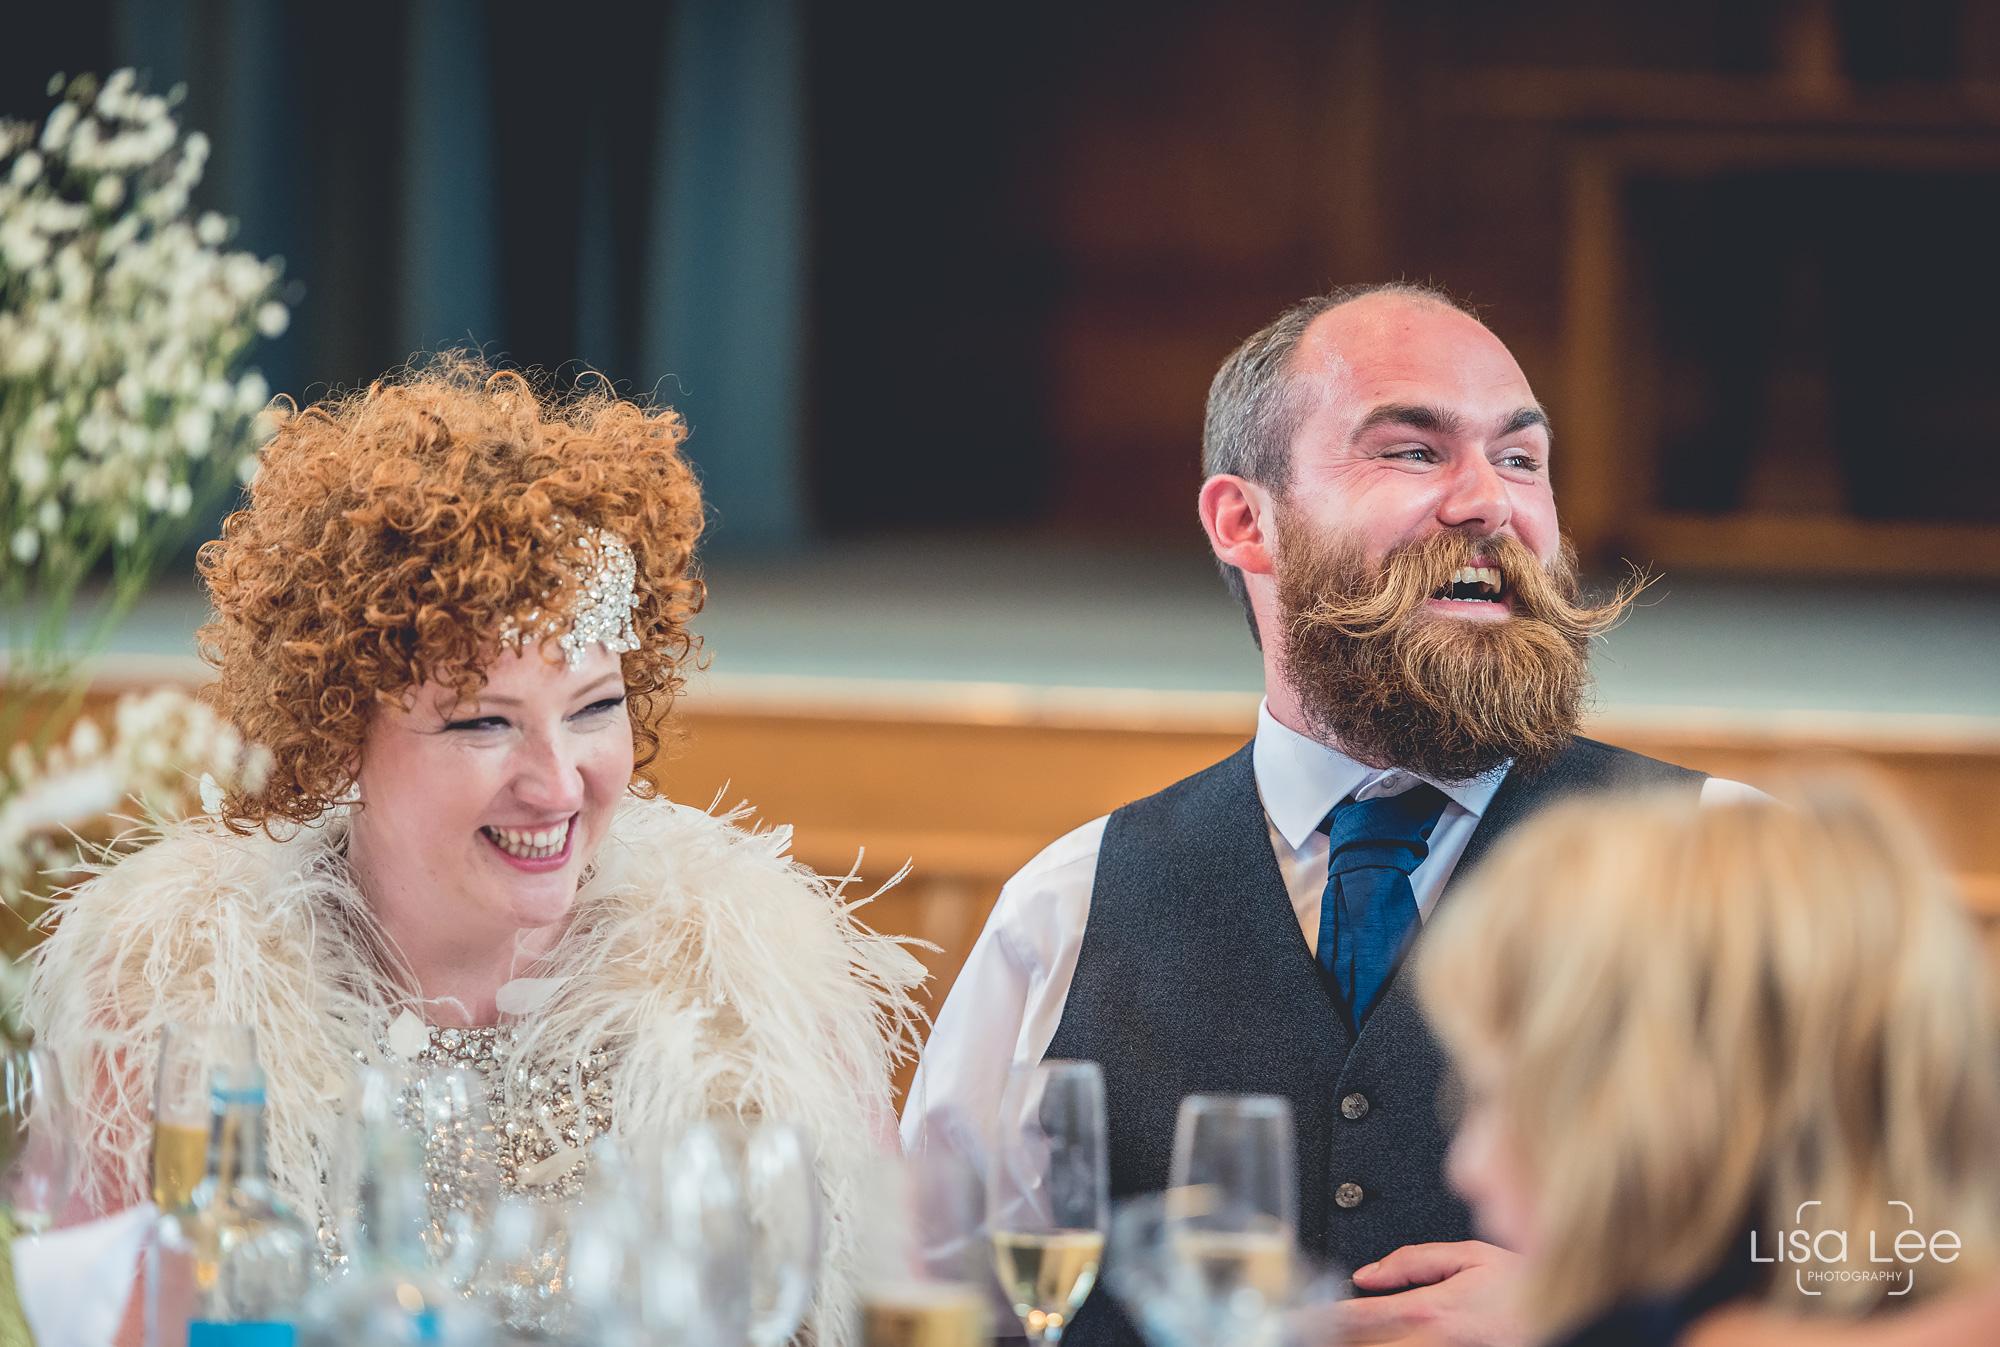 lisa-lee-wedding-photography-afternoon-tea-talbot-heath-15.jpg